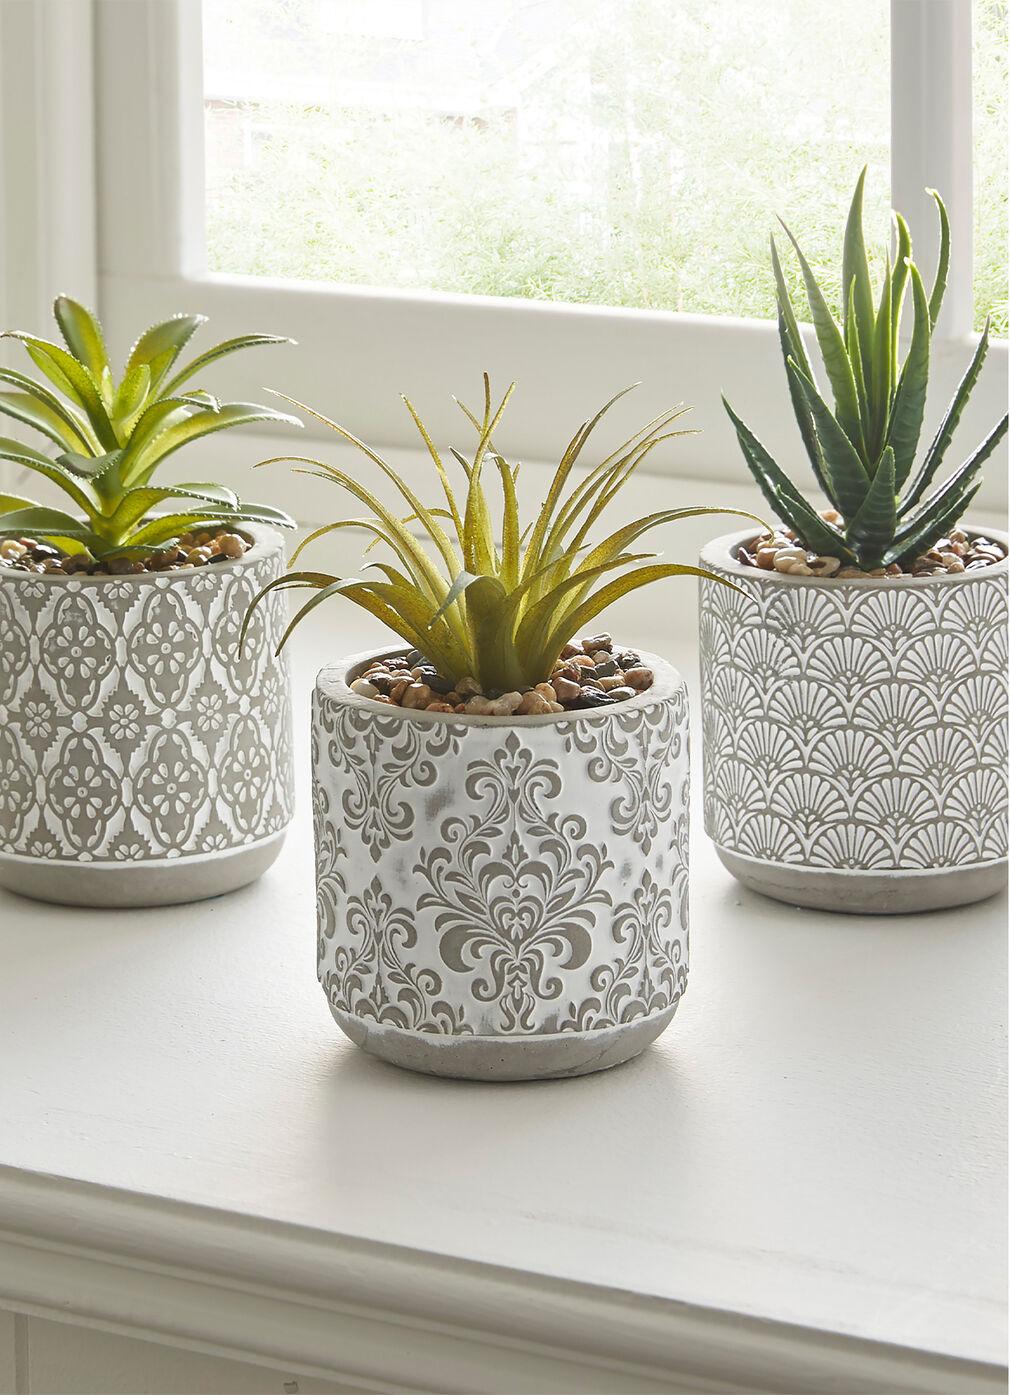 3 Faux Plants in Planters